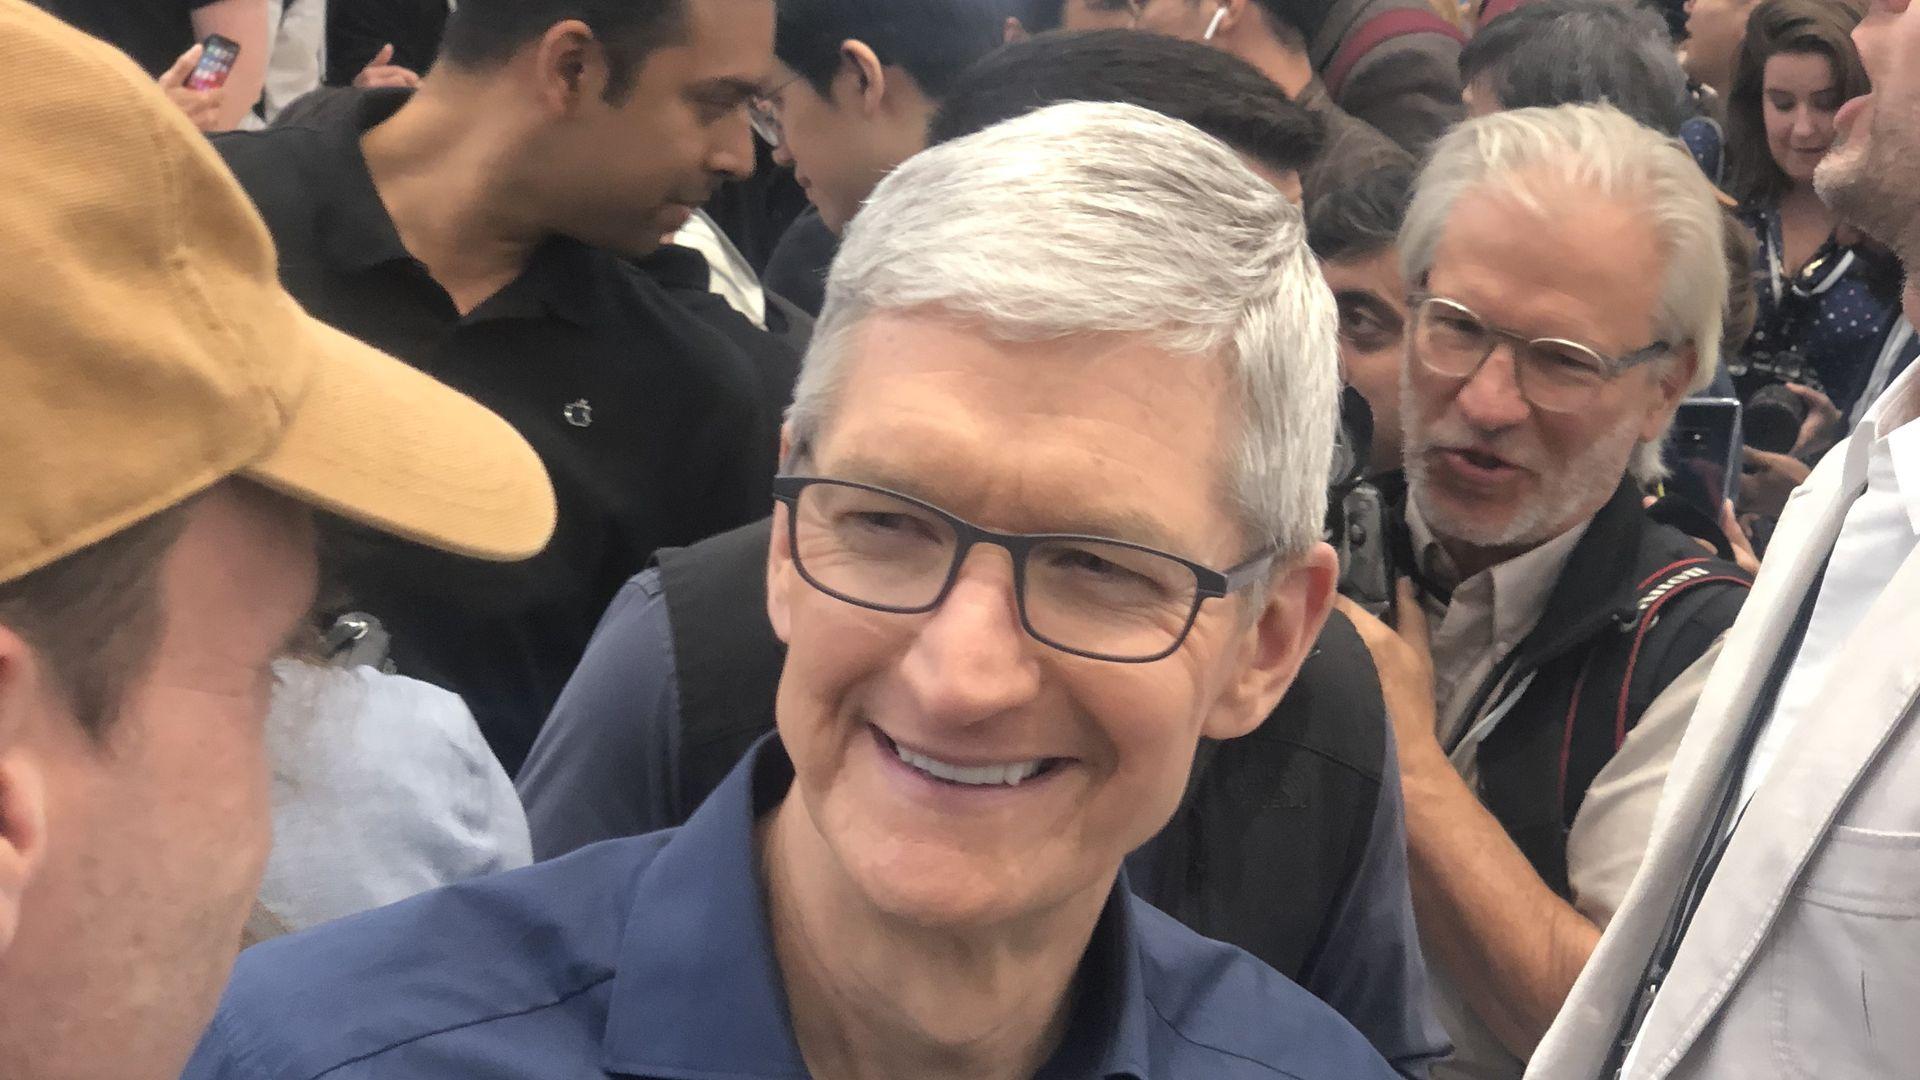 Techmeme: Apple announces a $1B Austin campus initially for 5,000